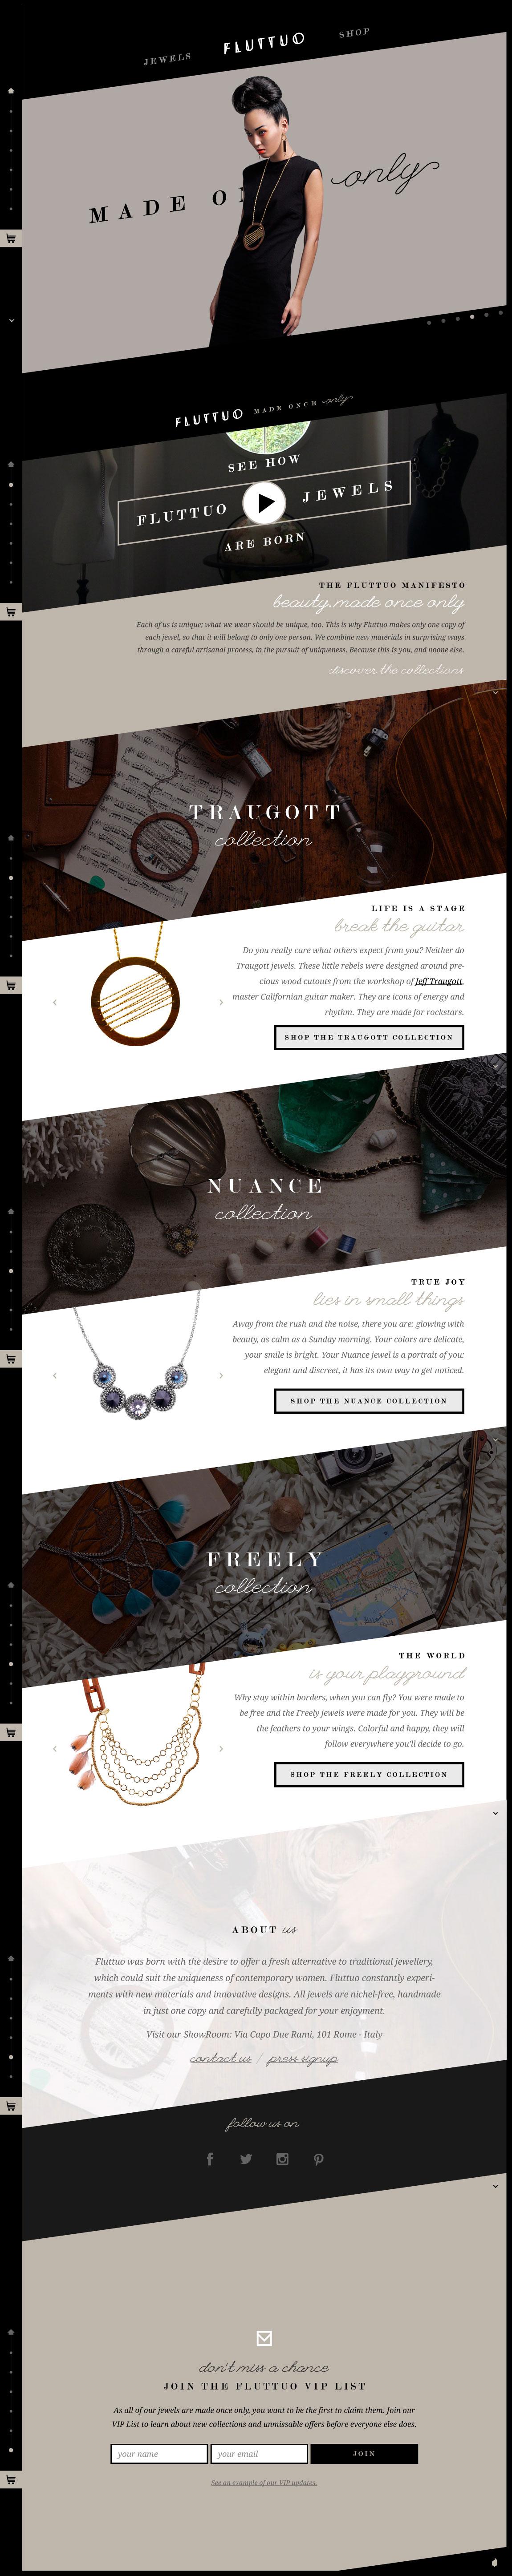 Fluttuo – Made Once Only Website Screenshot